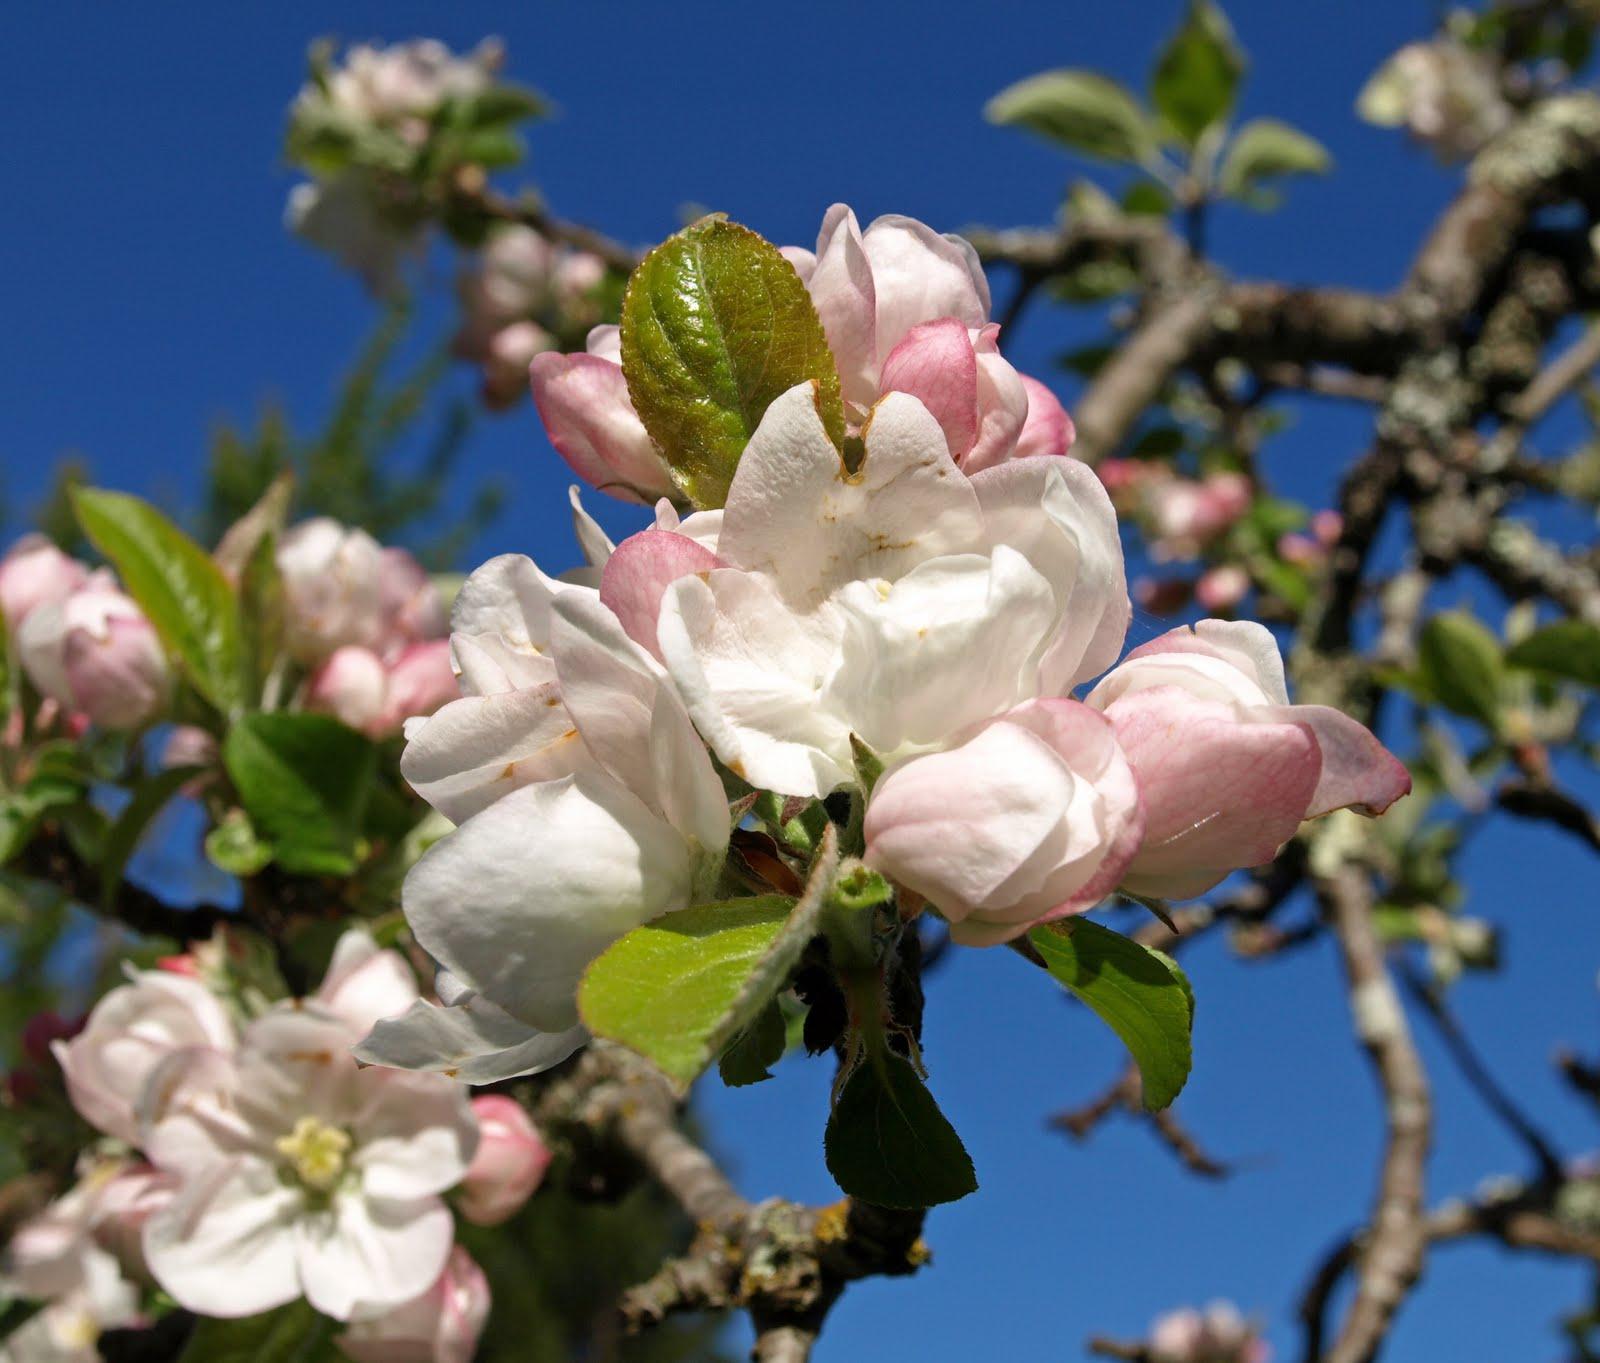 shelley macdonald designs apple blossom time. Black Bedroom Furniture Sets. Home Design Ideas